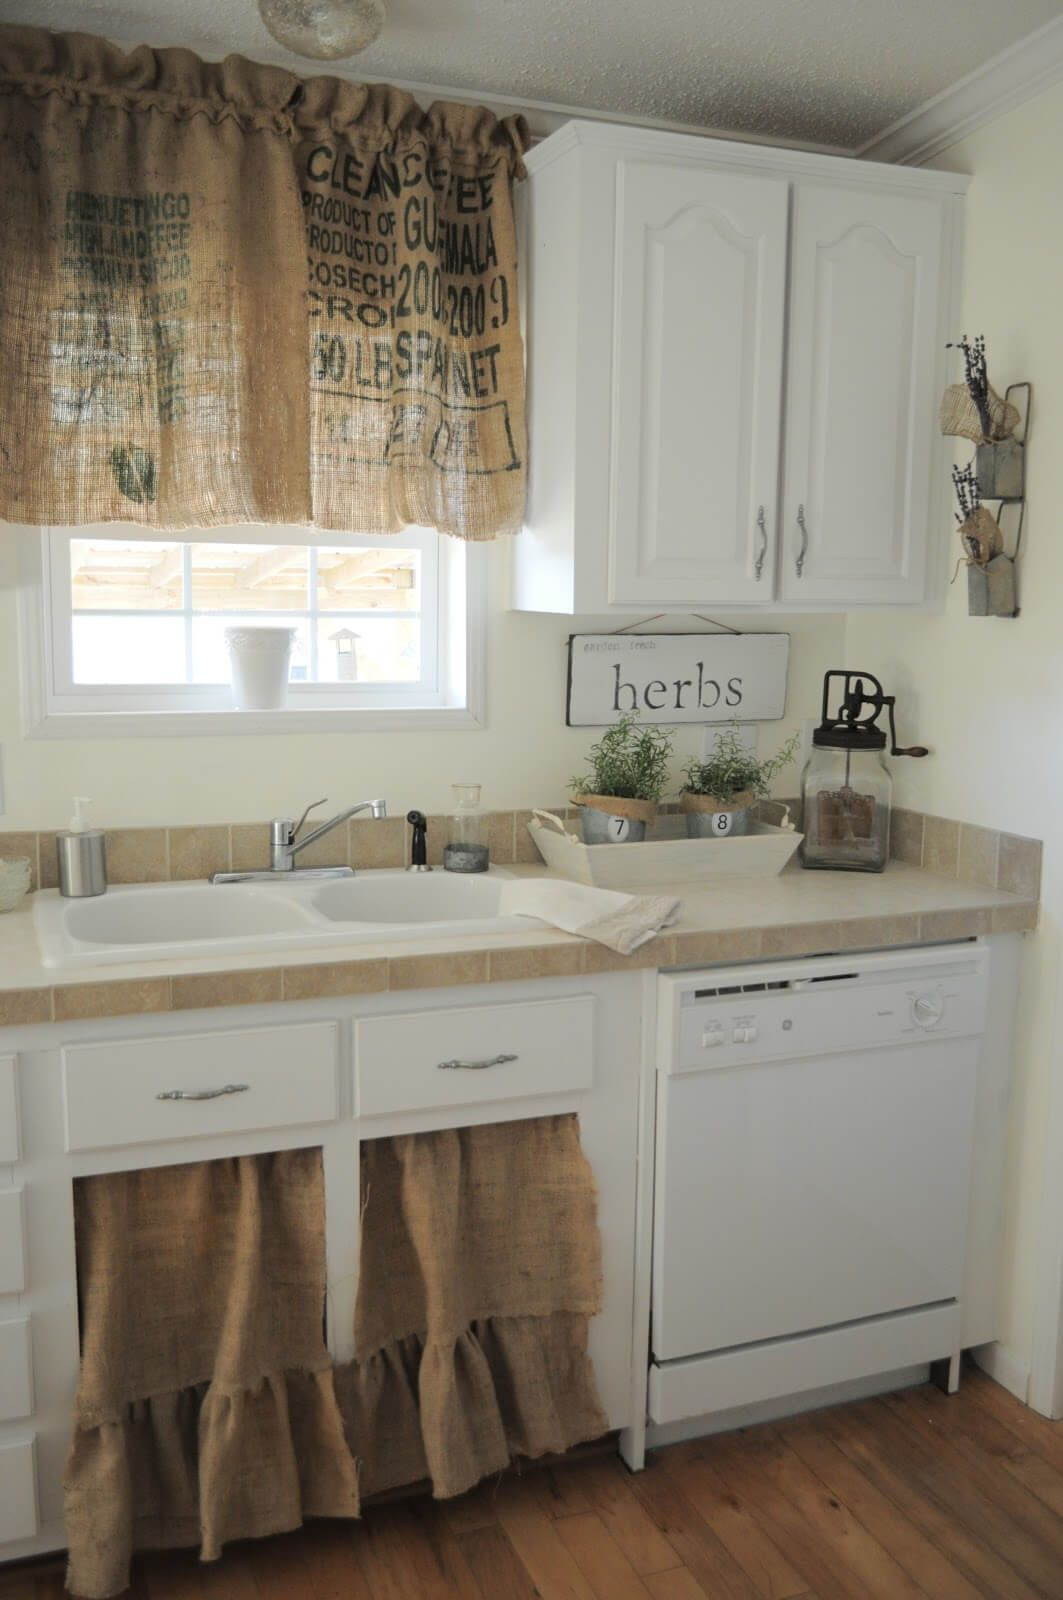 24 Unique Kitchen Cabinet Curtain Ideas For An Adorable Home Decor